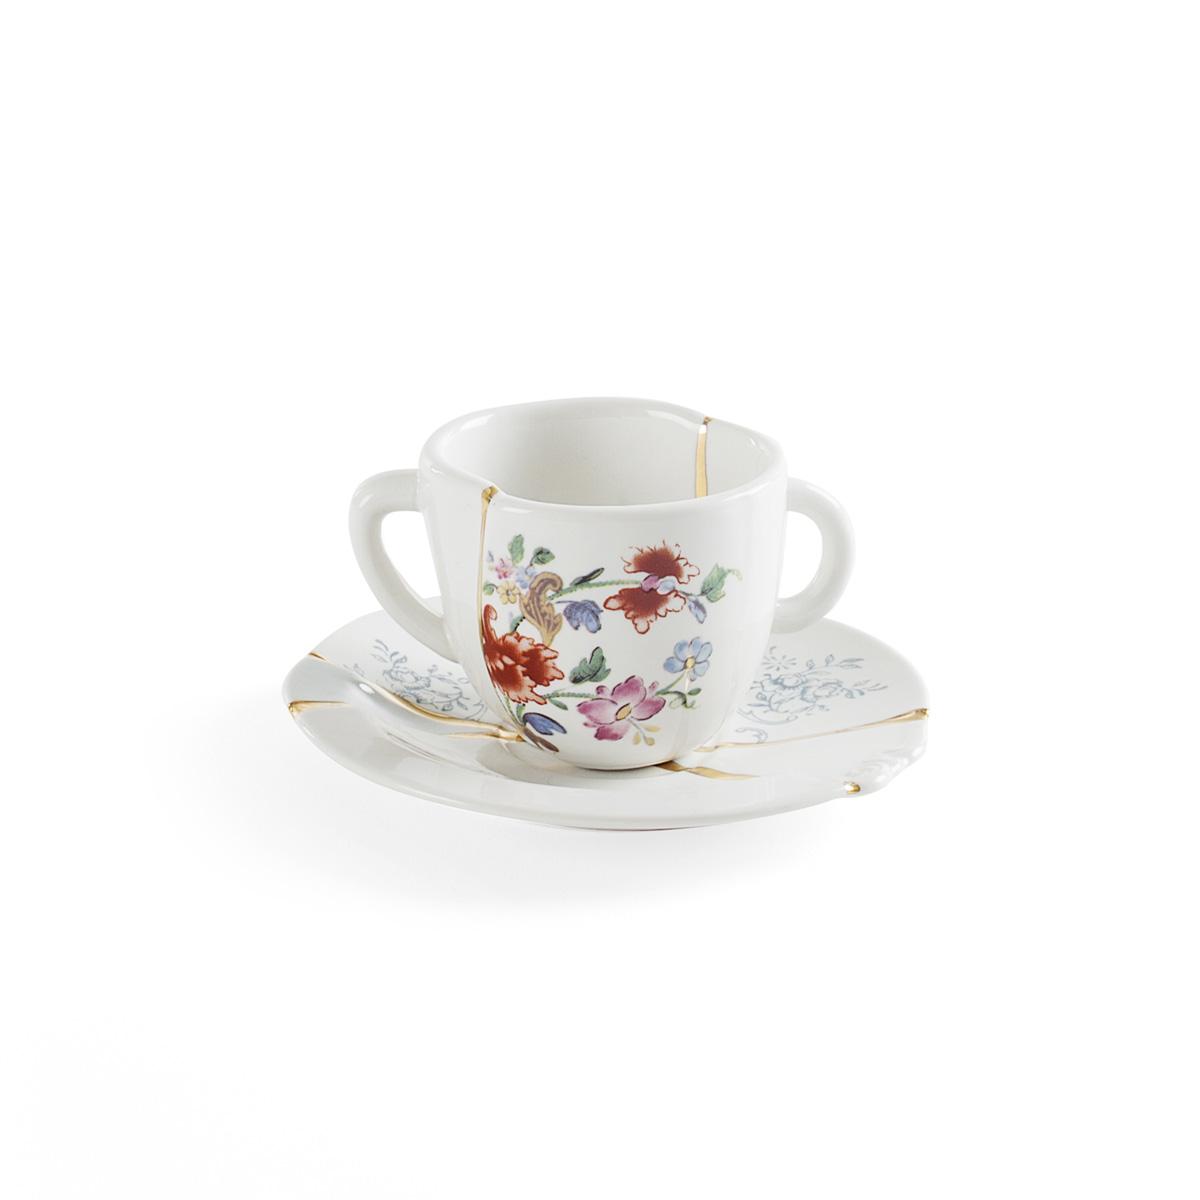 Seletti - KINTSUGI - Tazzina Caffè n°1 in porcellana